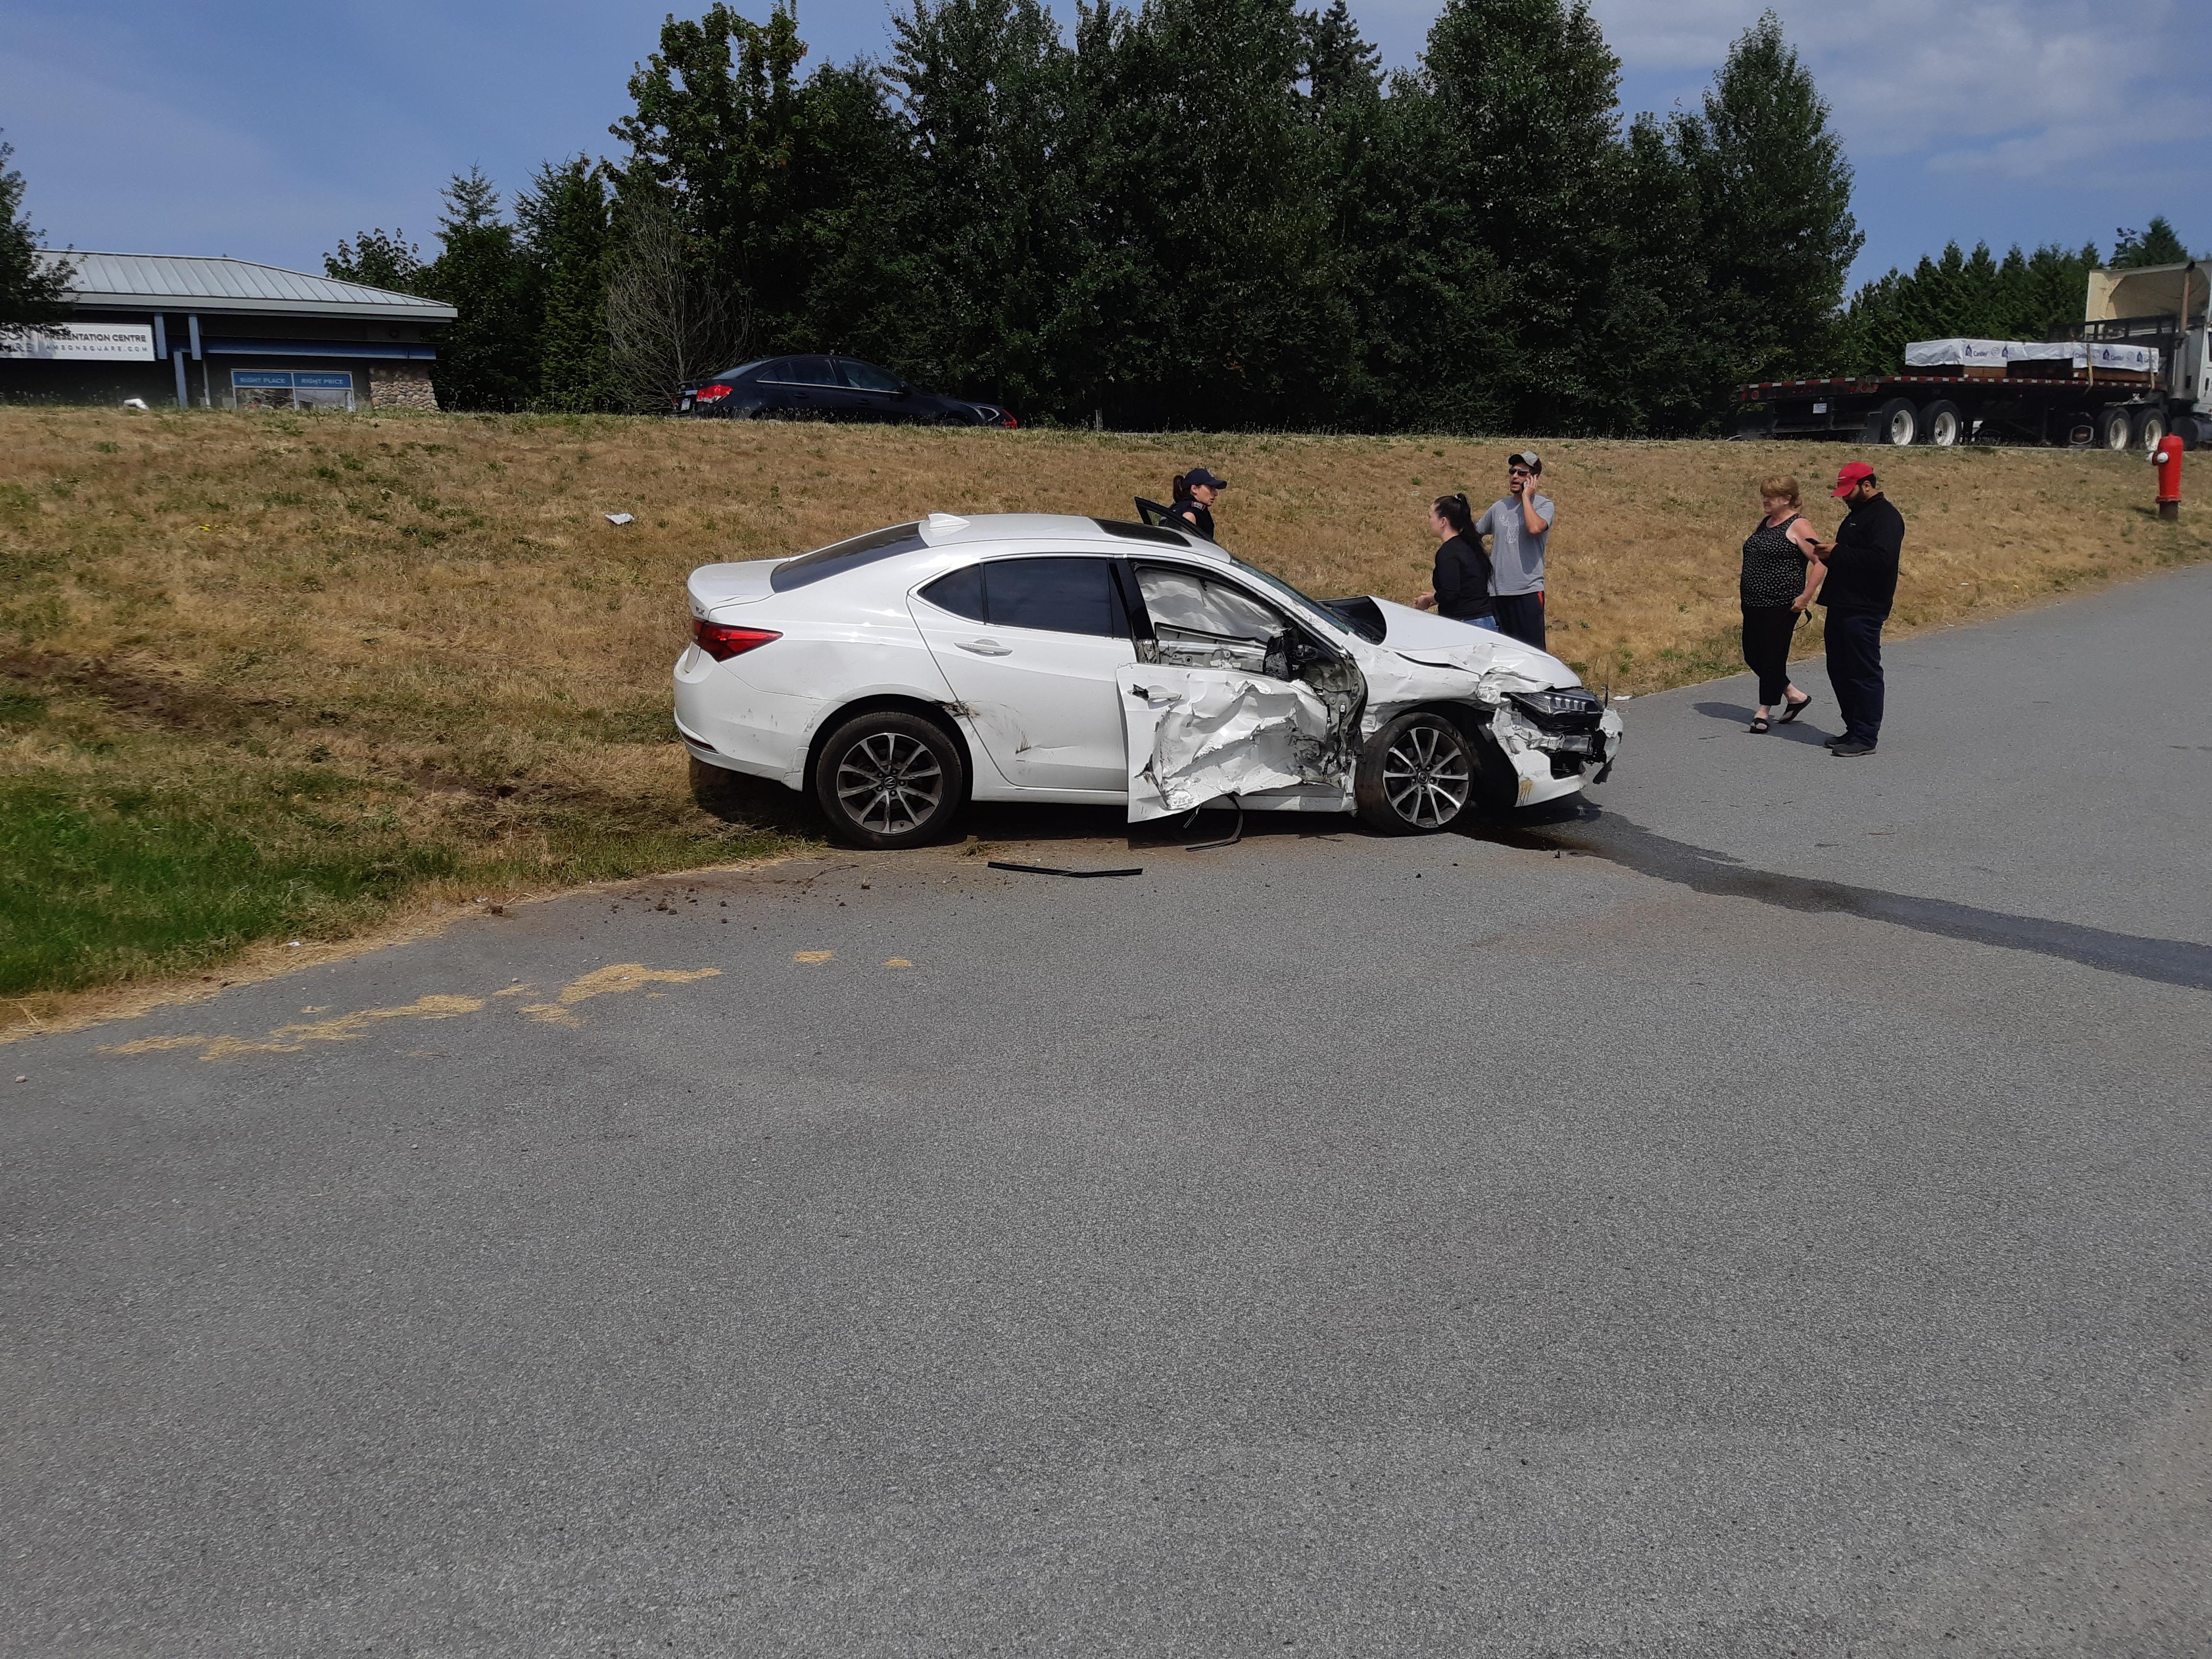 Collision in Surrey